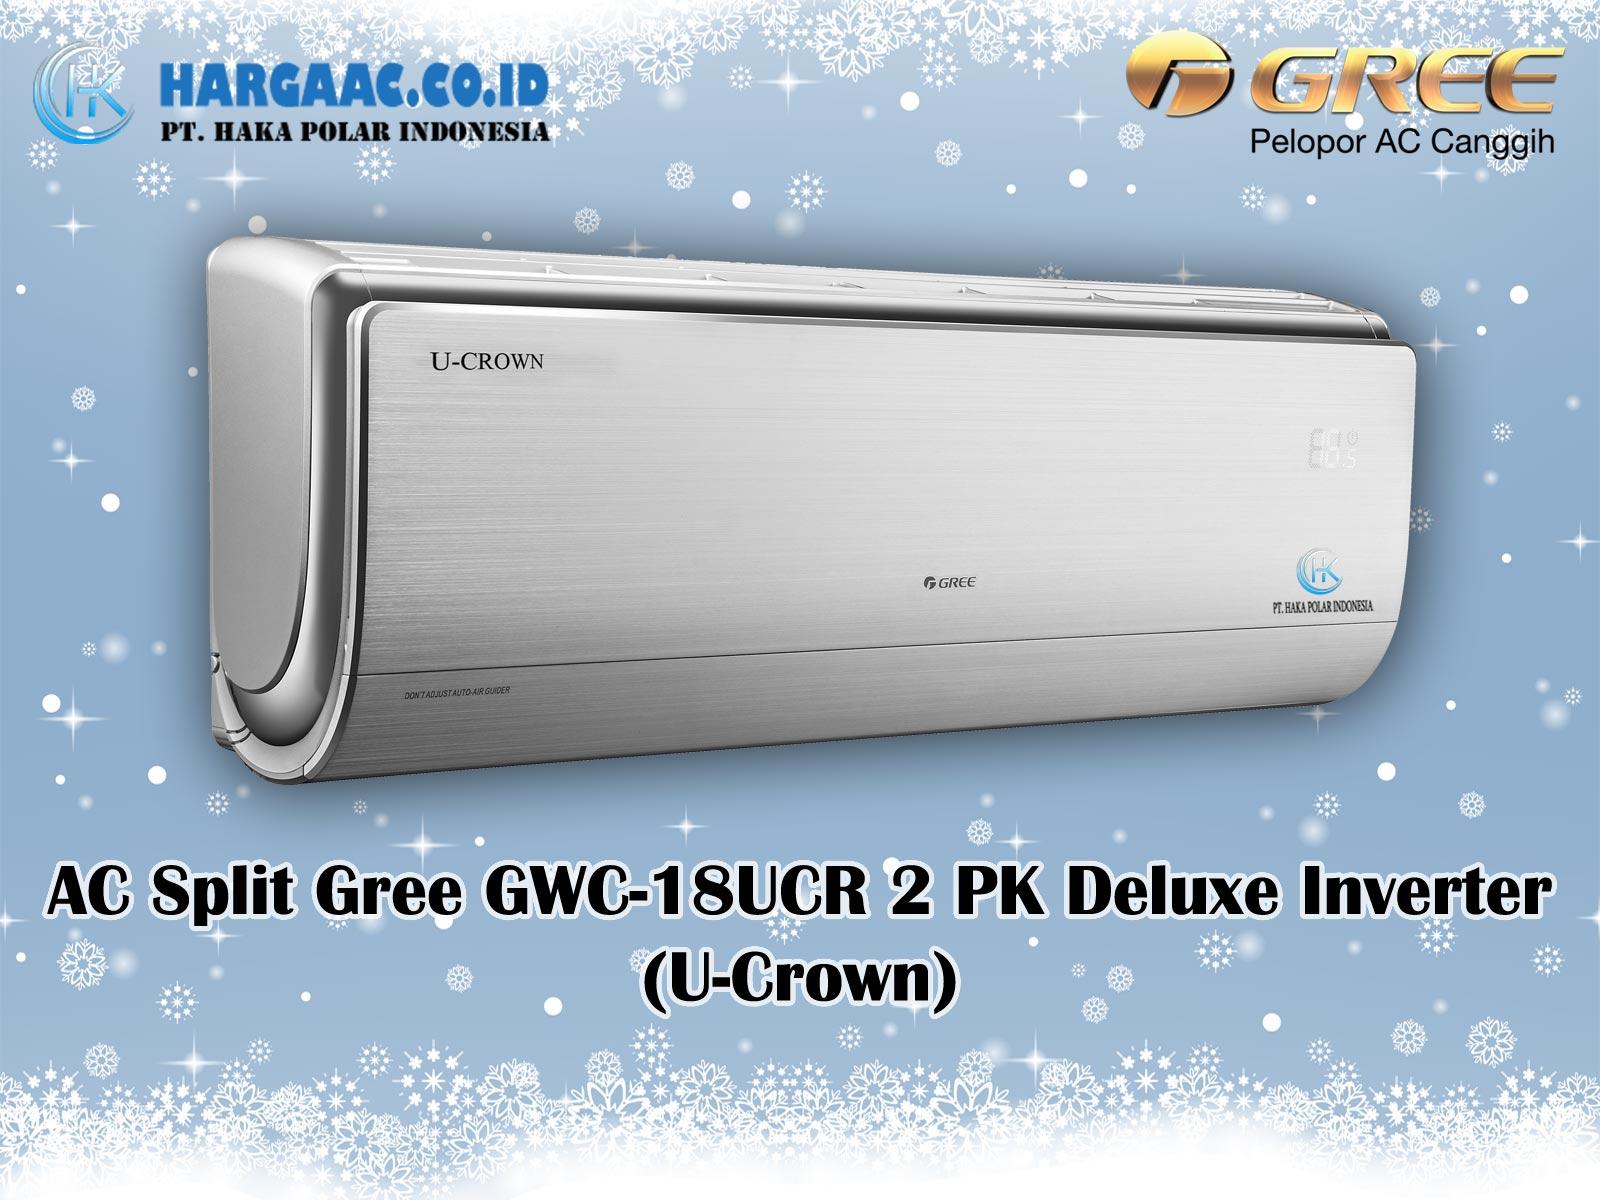 Harga Jual AC Split Gree GWC-18UCR 2 PK Deluxe Inverter U-Crown